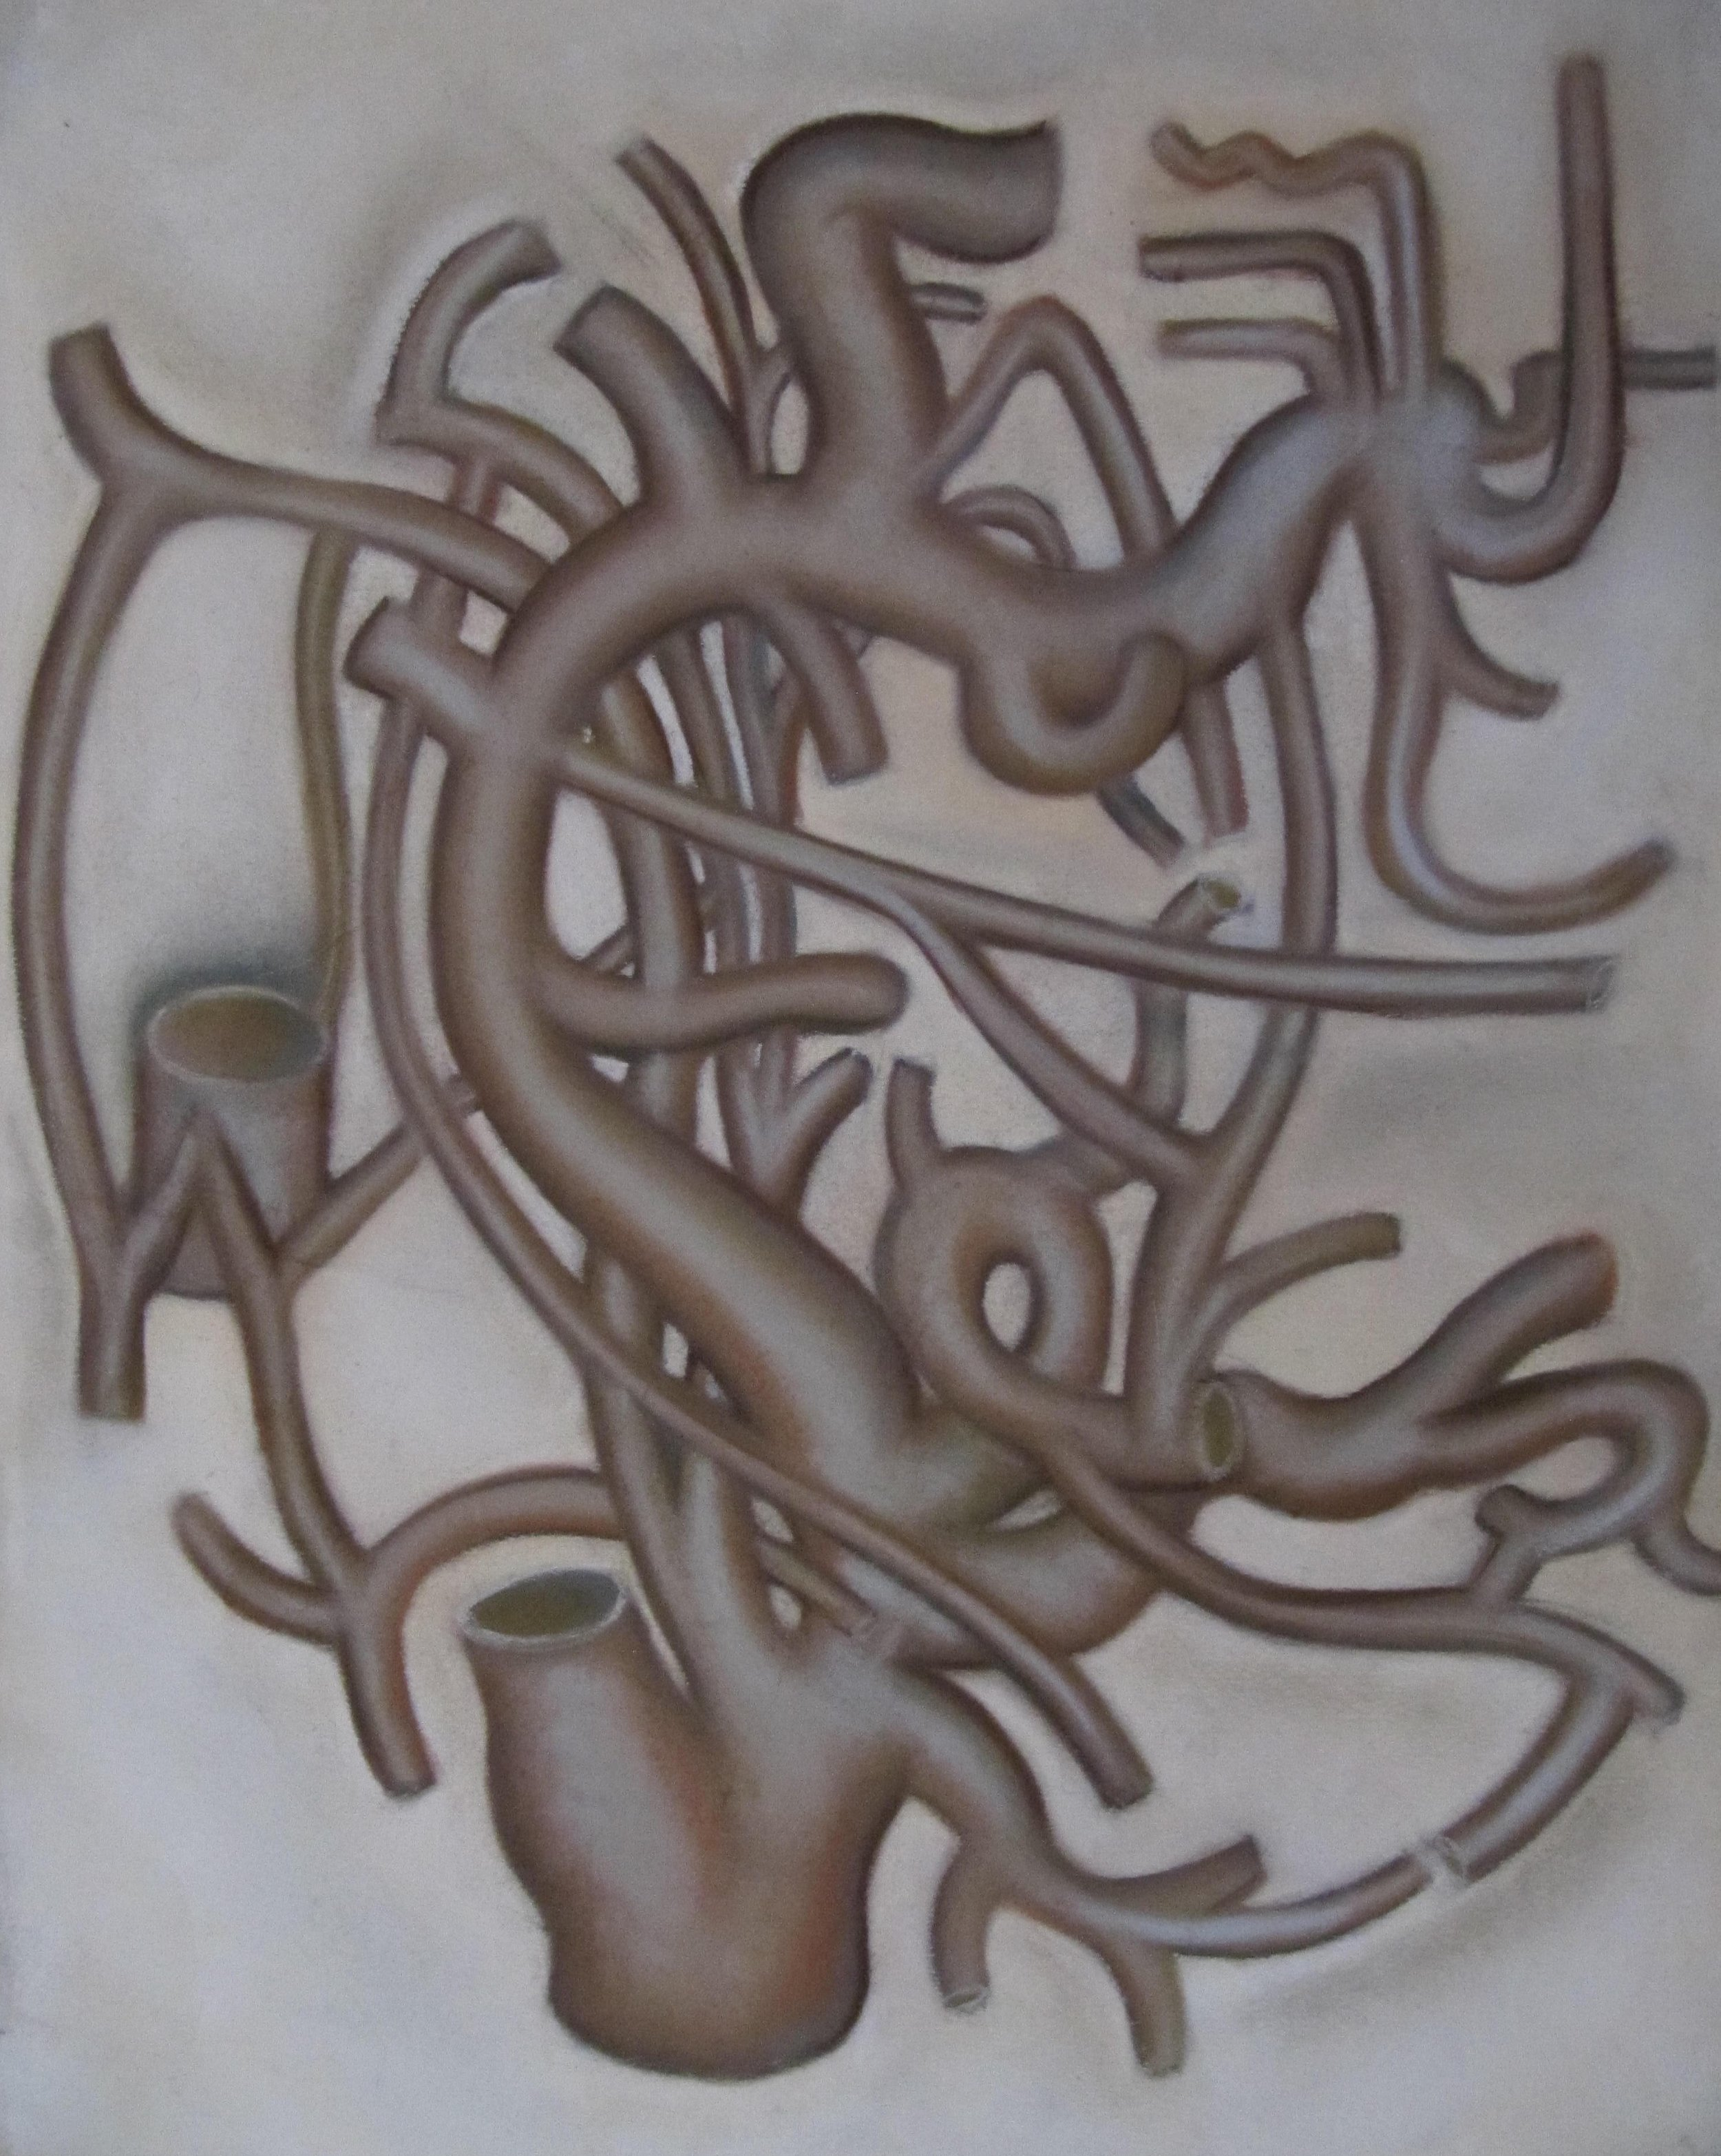 External Carotid Artery, 1990